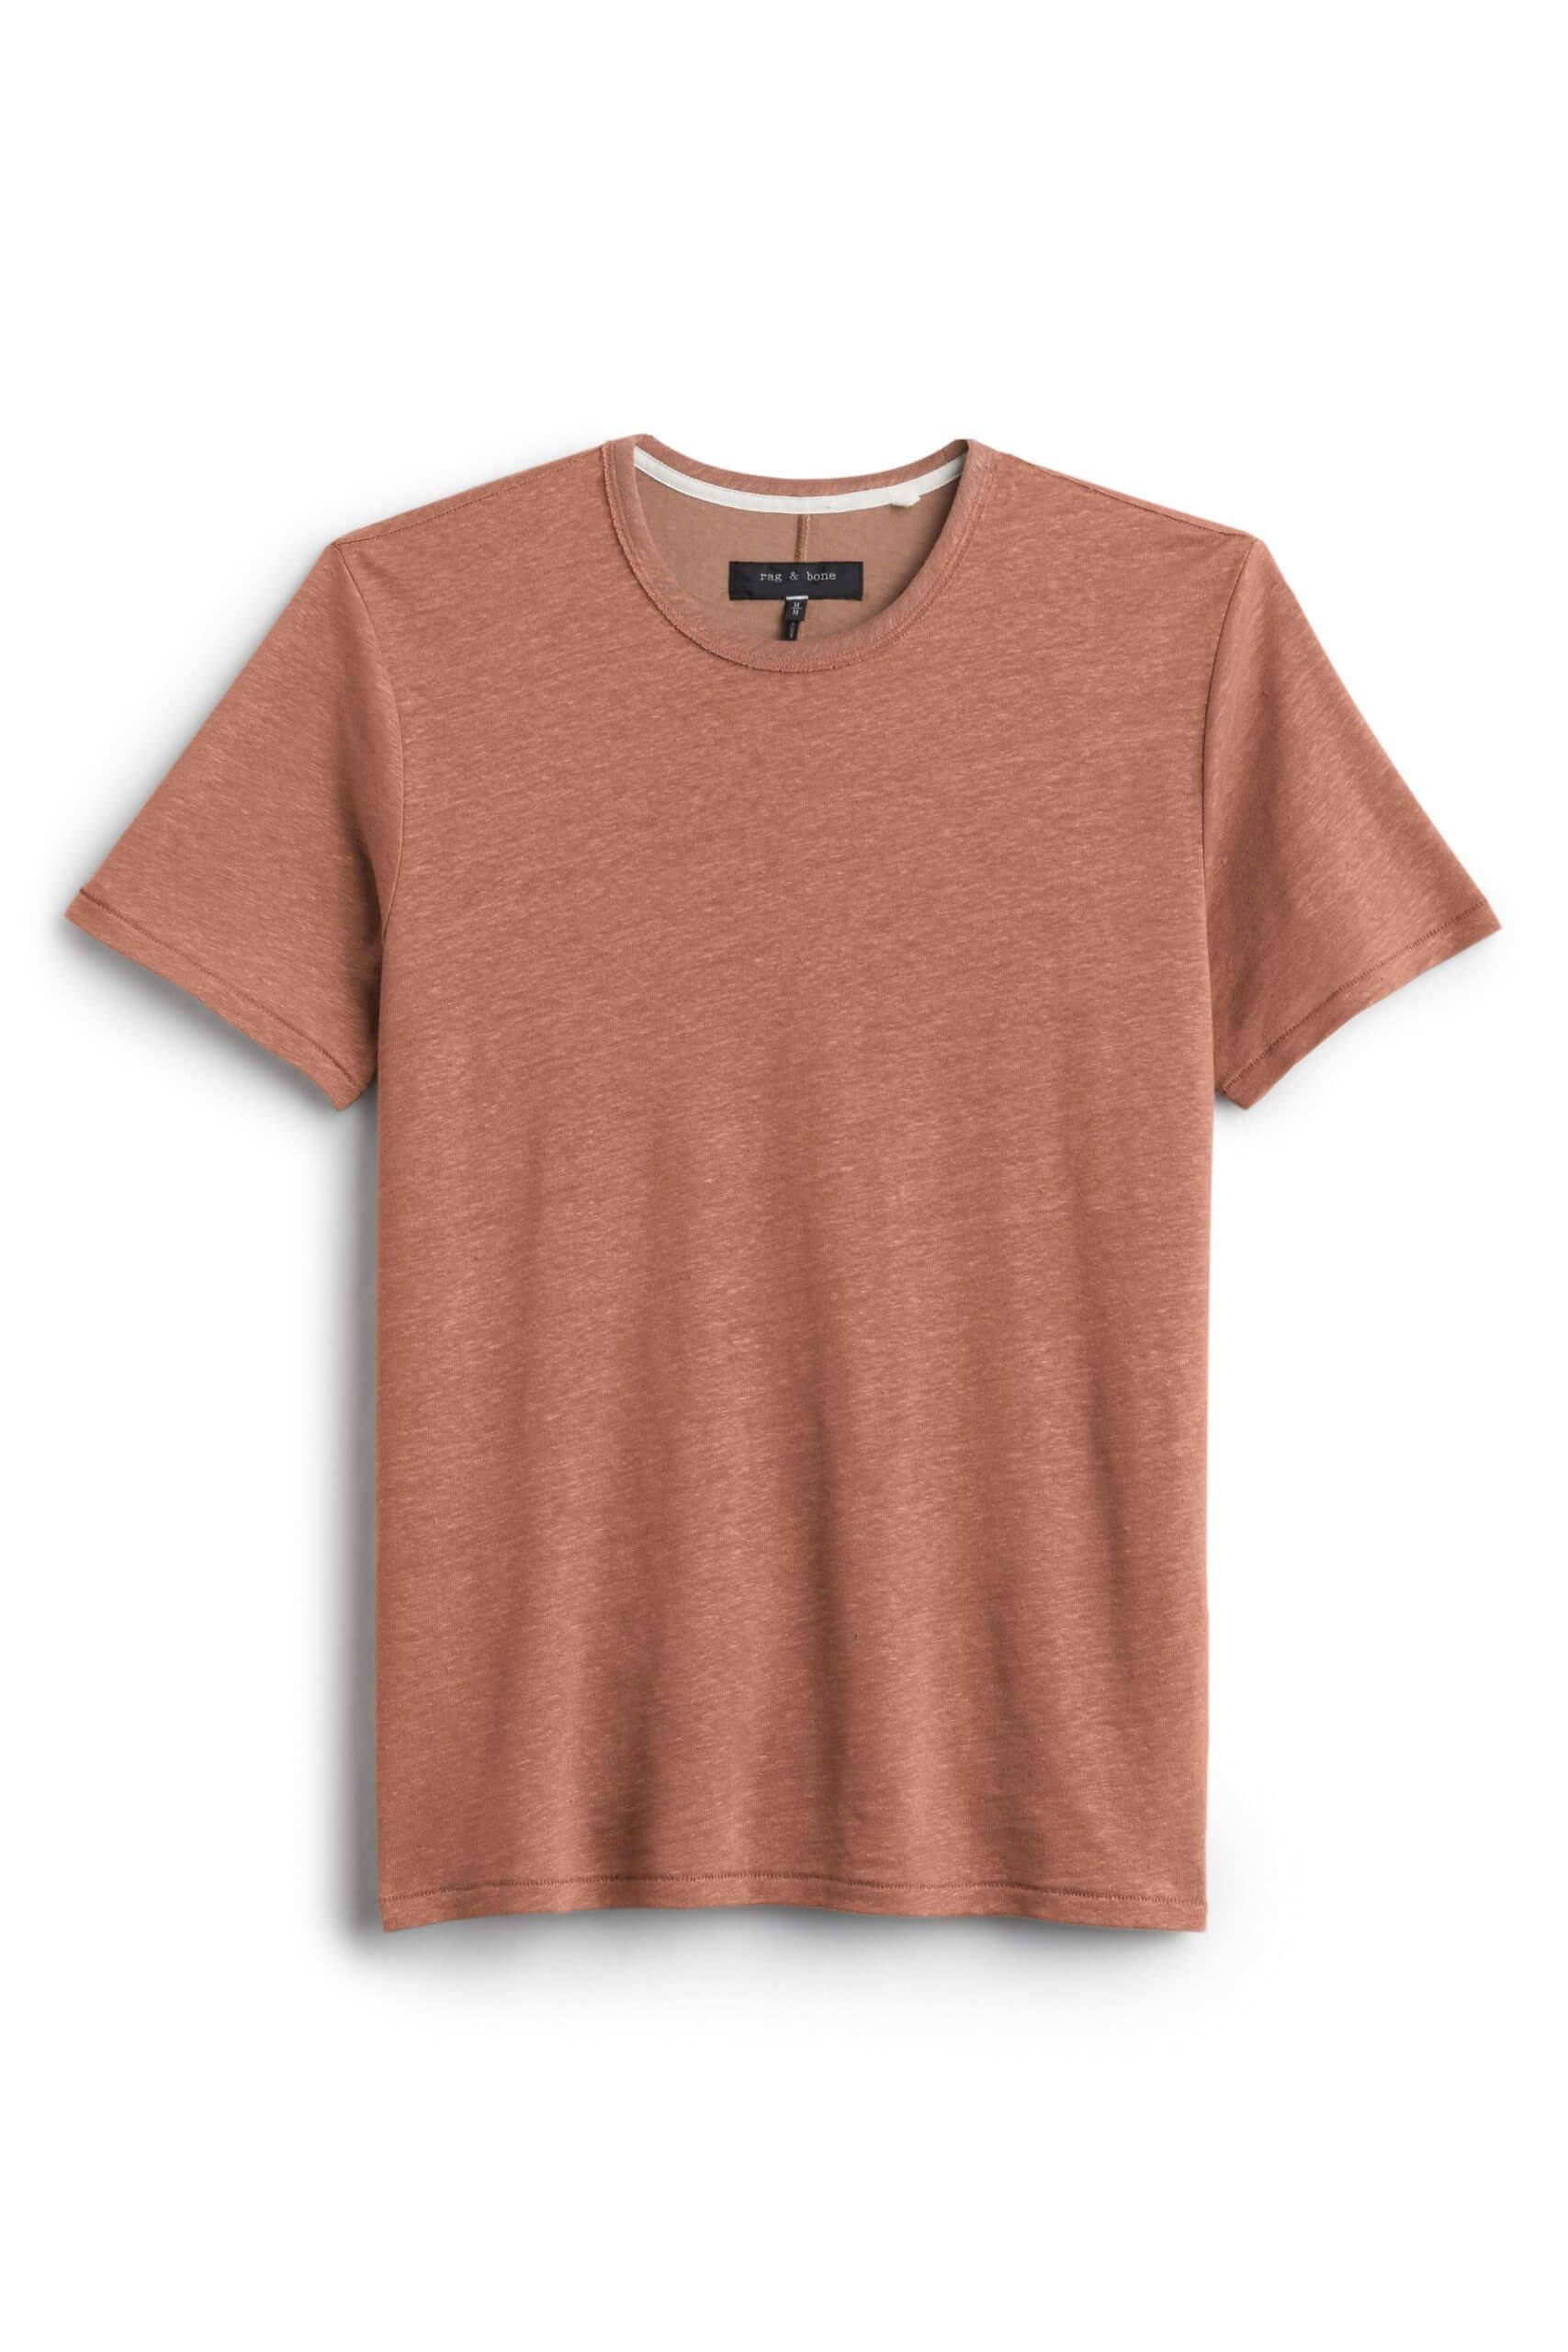 Stitch Fix Men's rusted orange crewneck t-shirt.